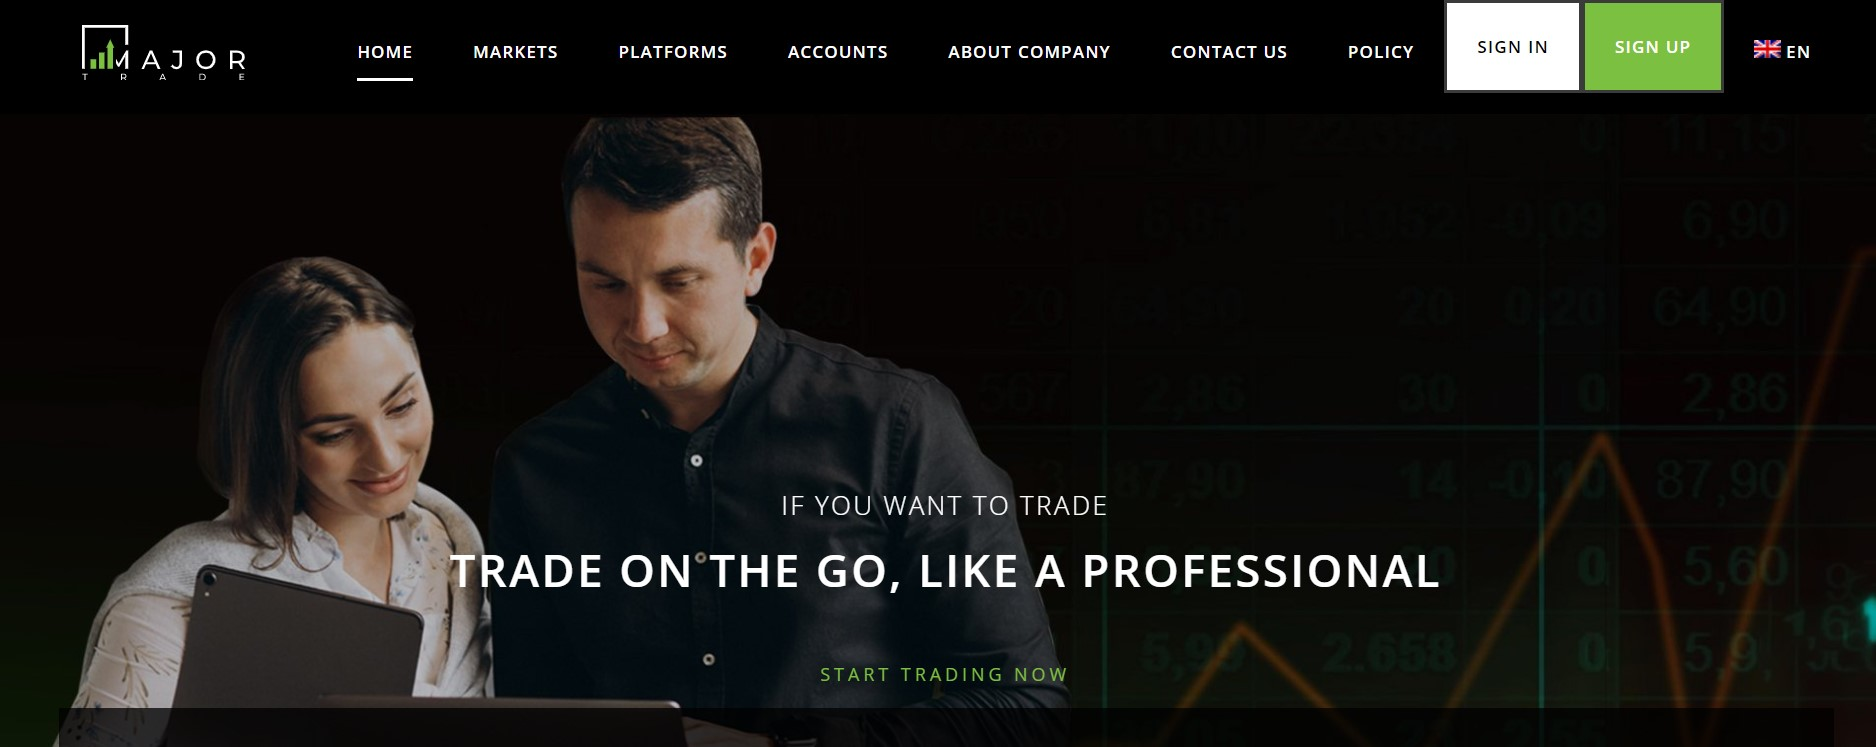 MajorTrade website